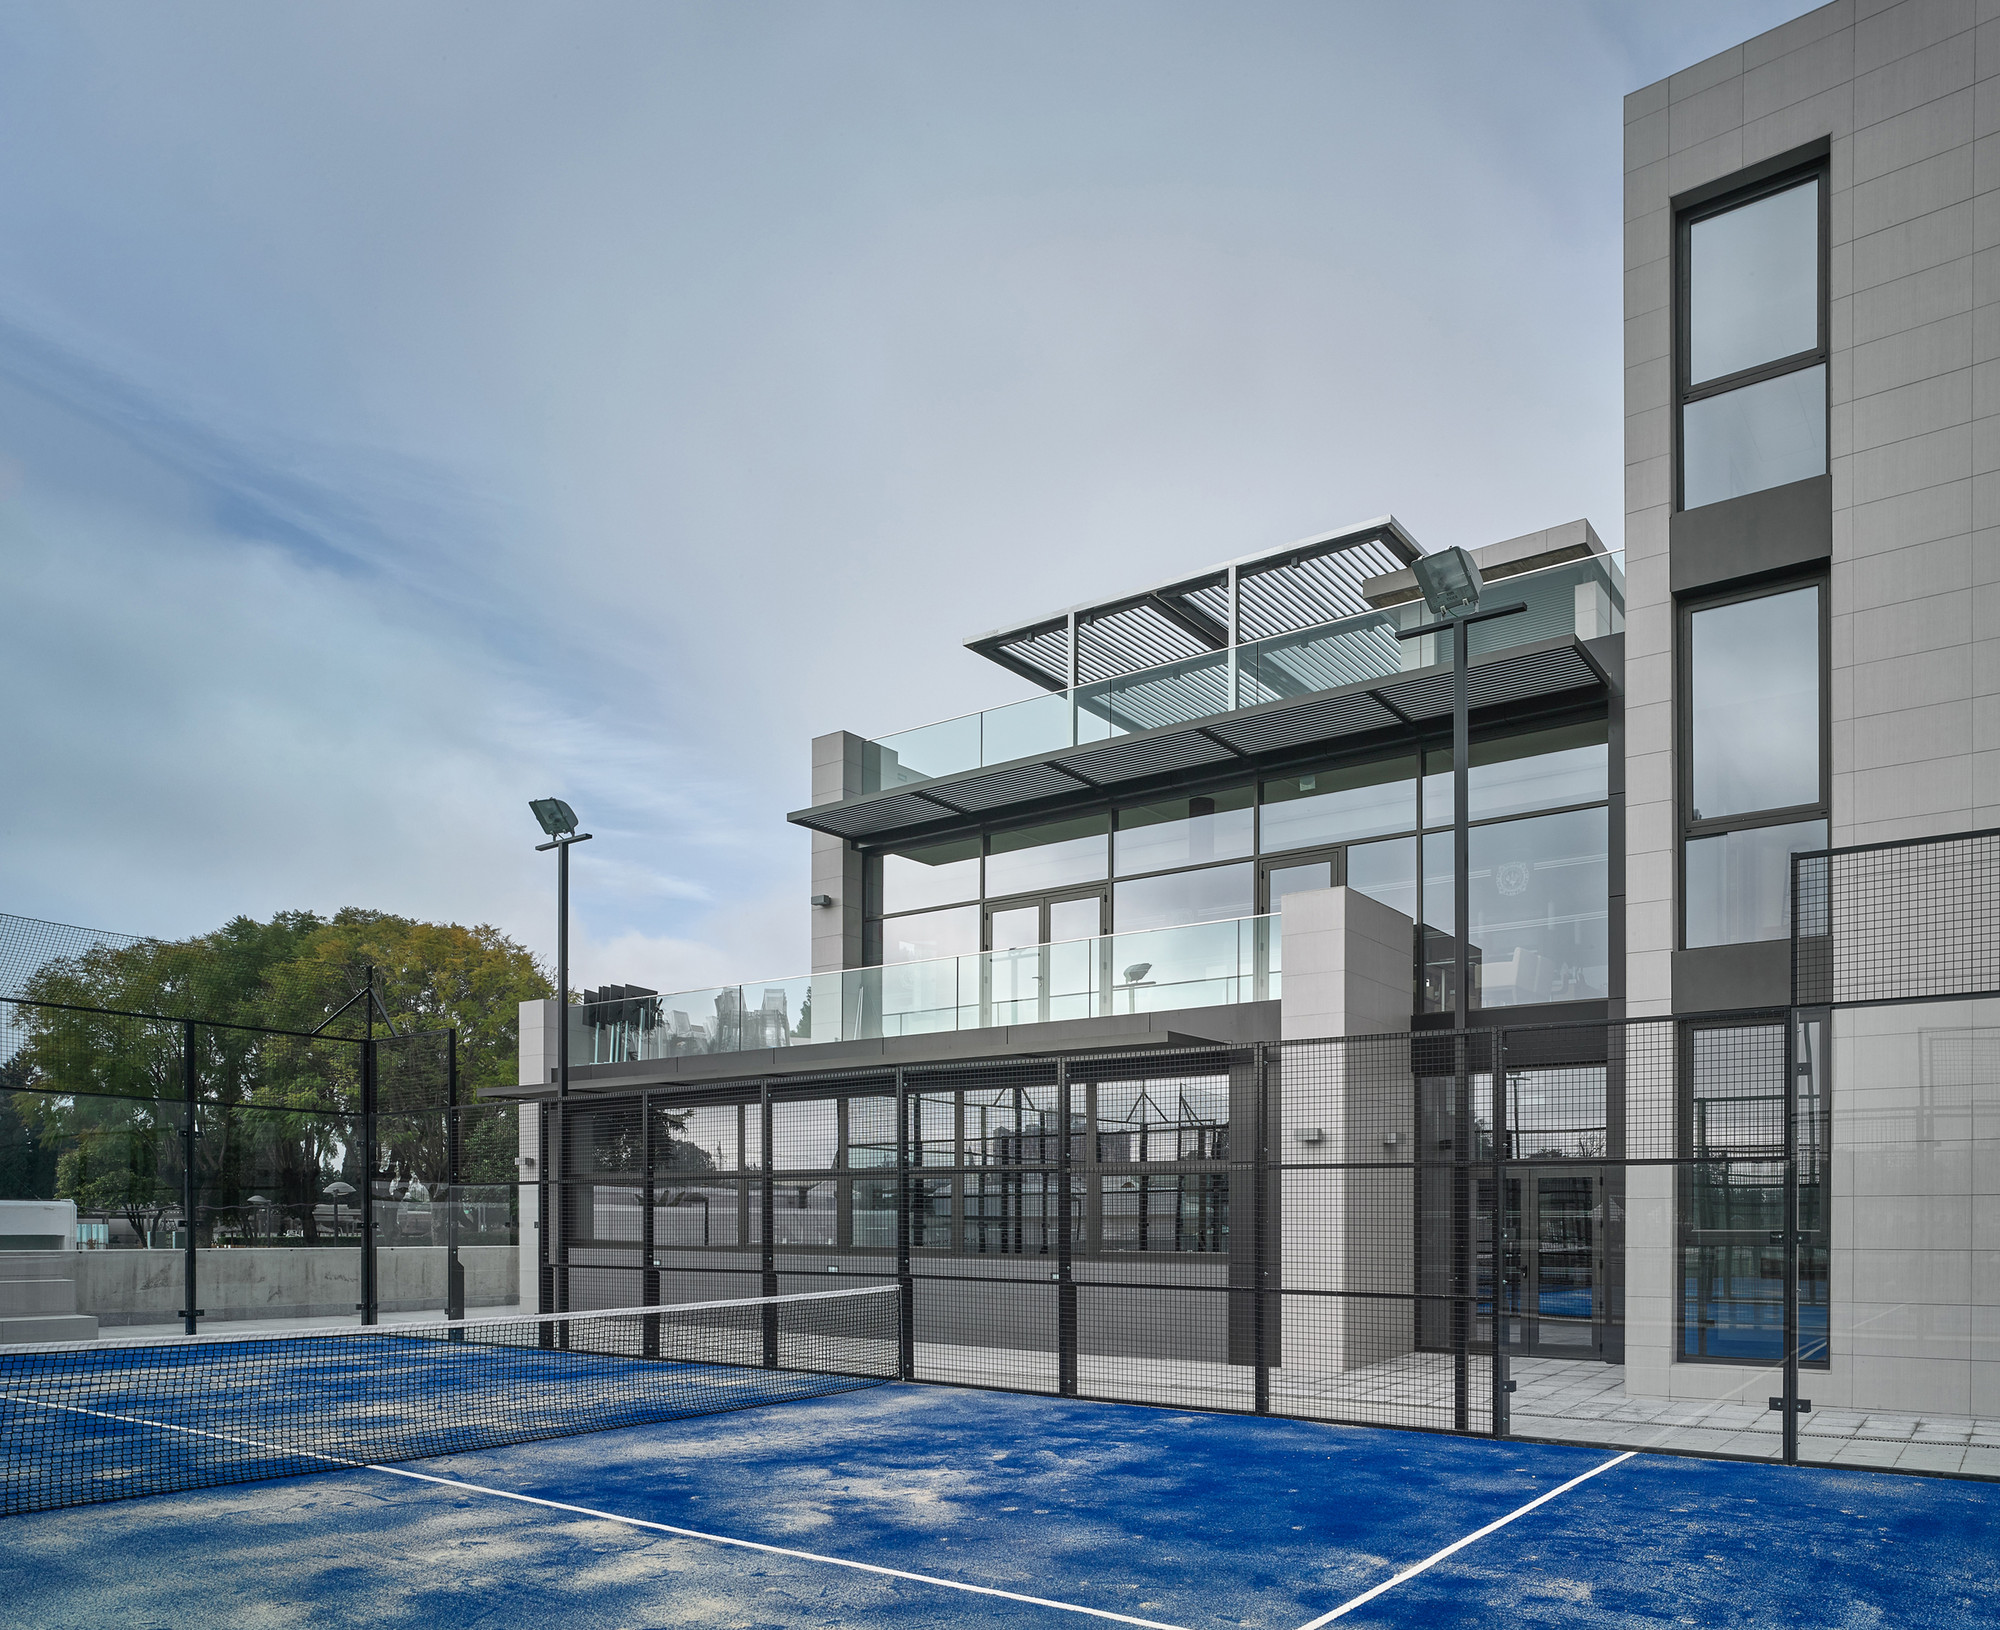 Circulo Mercantil Industrial Sports Center / Manuel Quijano Vallejo